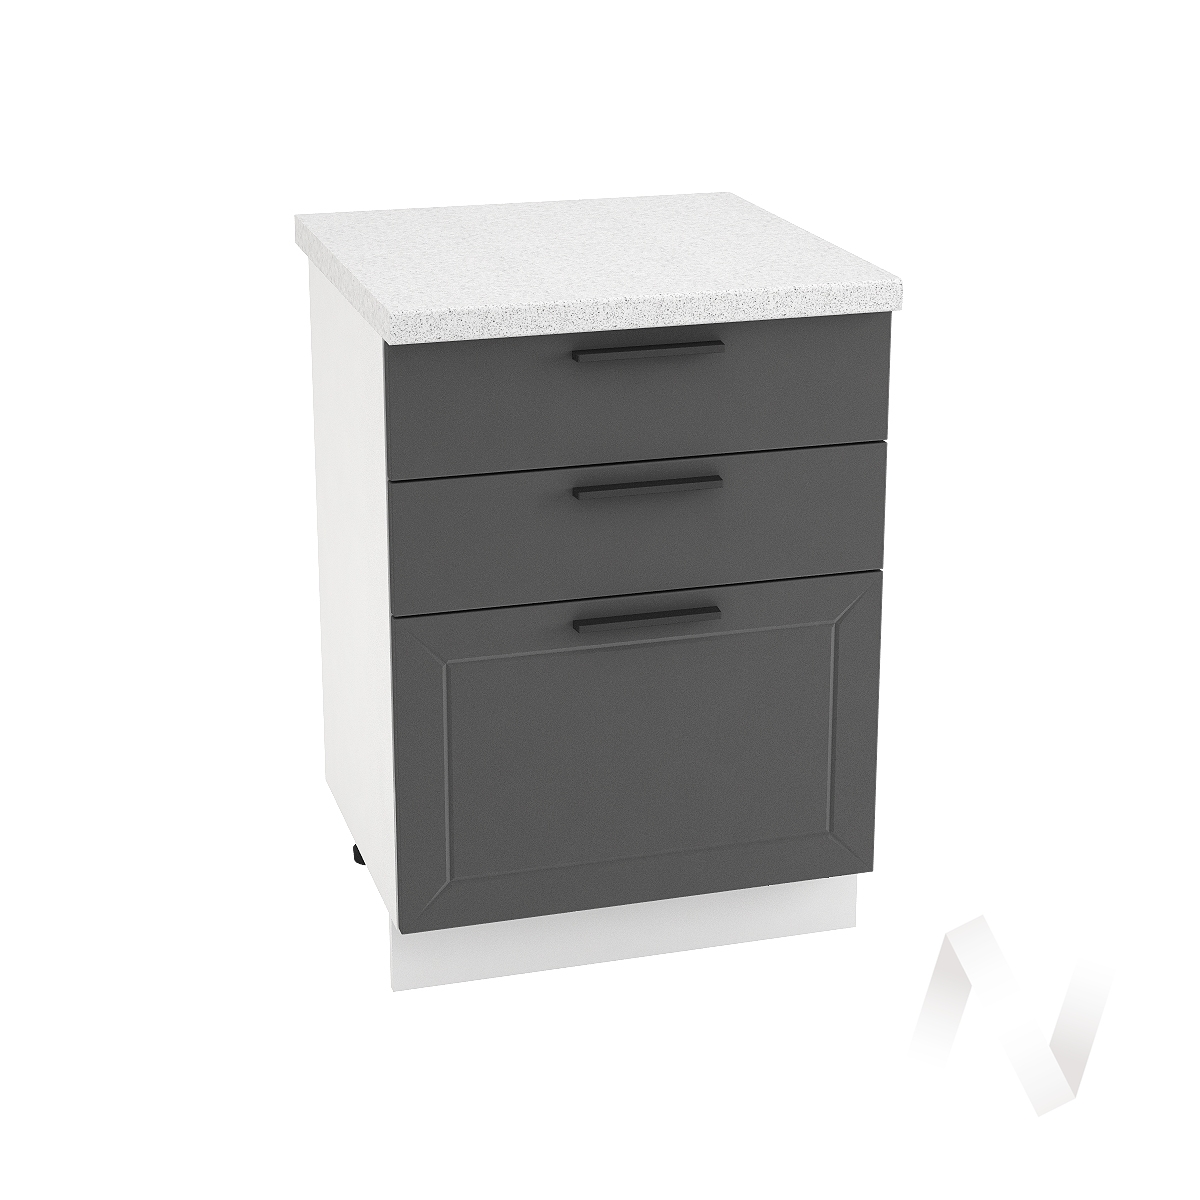 "Кухня ""Глетчер"": Шкаф нижний с 3-мя ящиками 600, ШН3Я 600 (Маренго силк/корпус белый)"